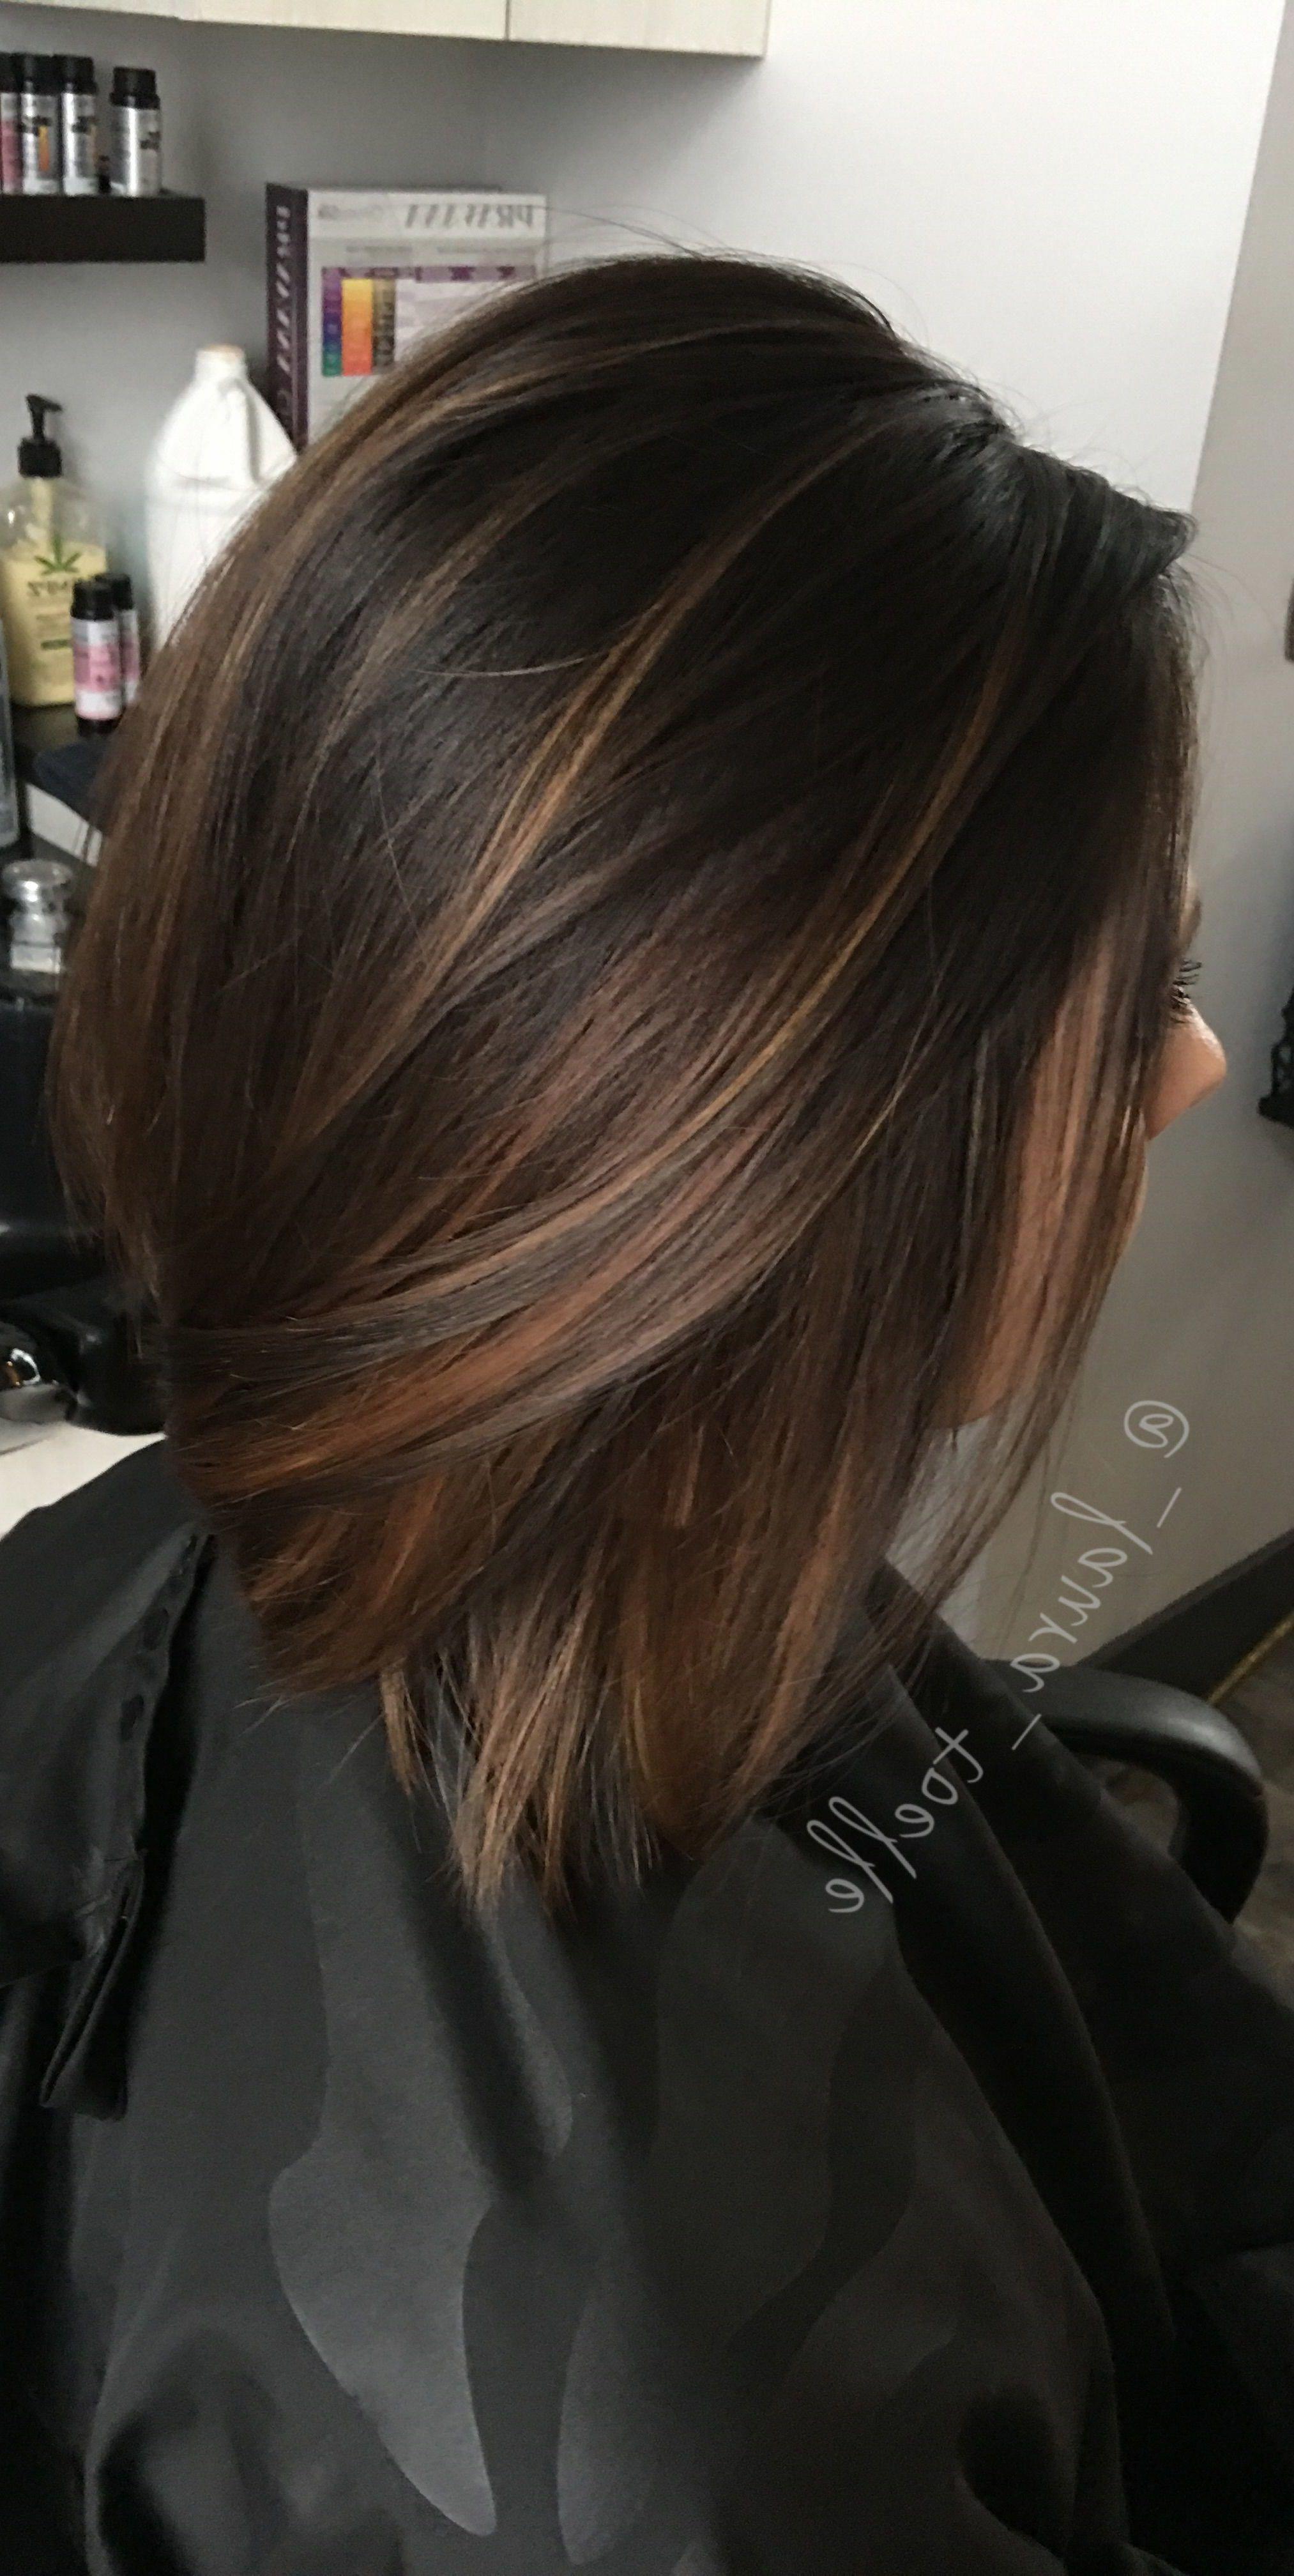 28 Incredible Examples Of Caramel Balayage On Short Dark Brown Hair Caramel Balayage On Short Dark B Brown Hair Balayage Short Hair Balayage Brown Blonde Hair